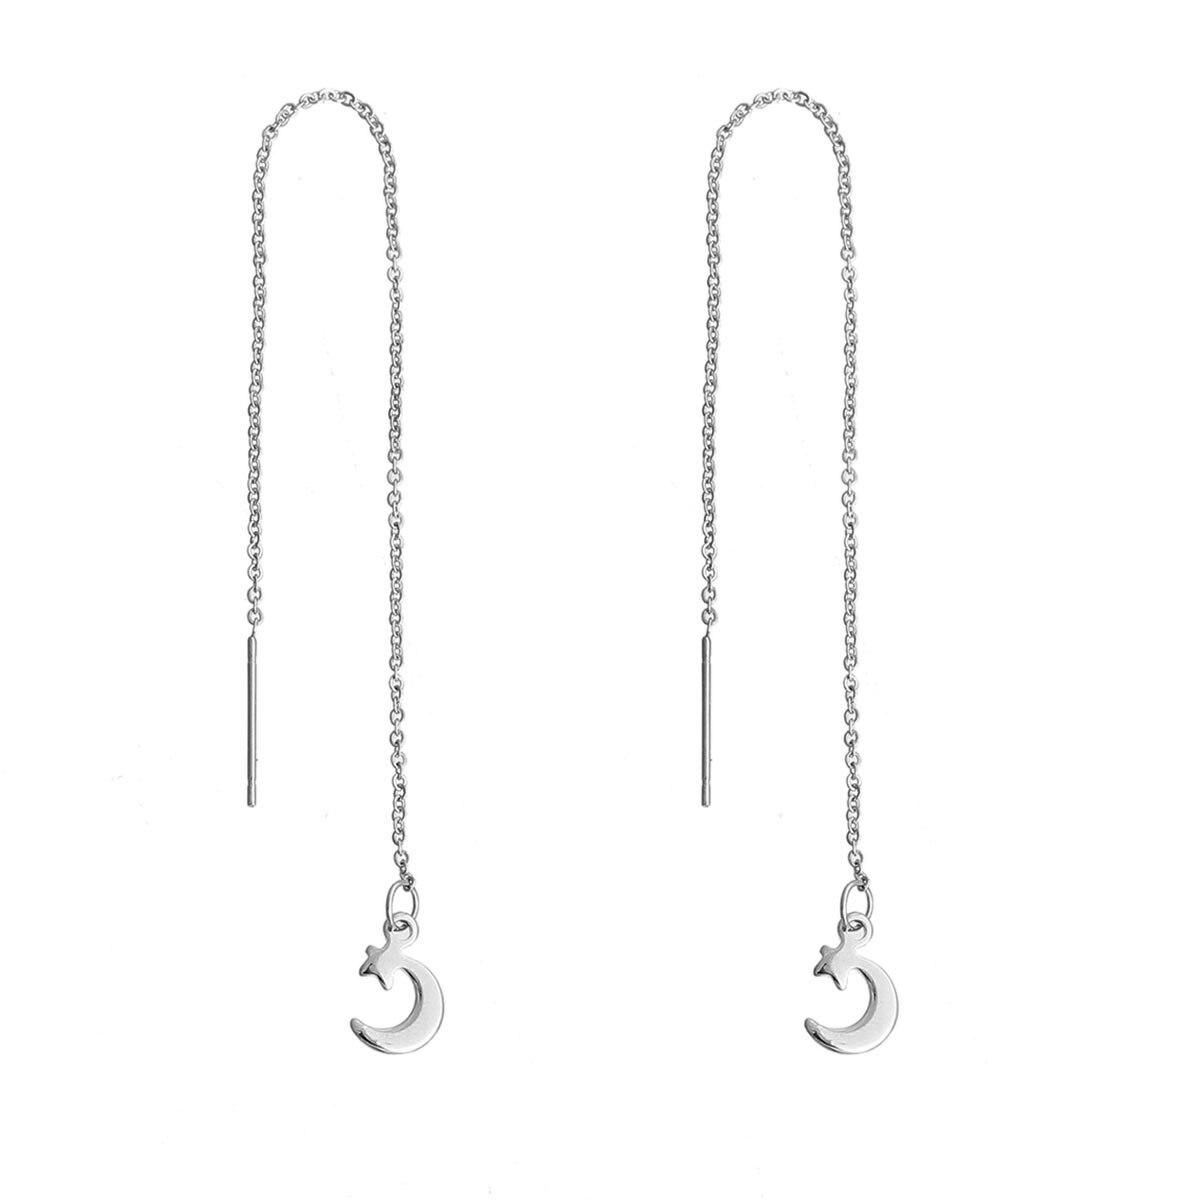 Doreen Box Stainless Steel Ear Thread Threader Earring Silver Tone Half  Moon Star 142cm(